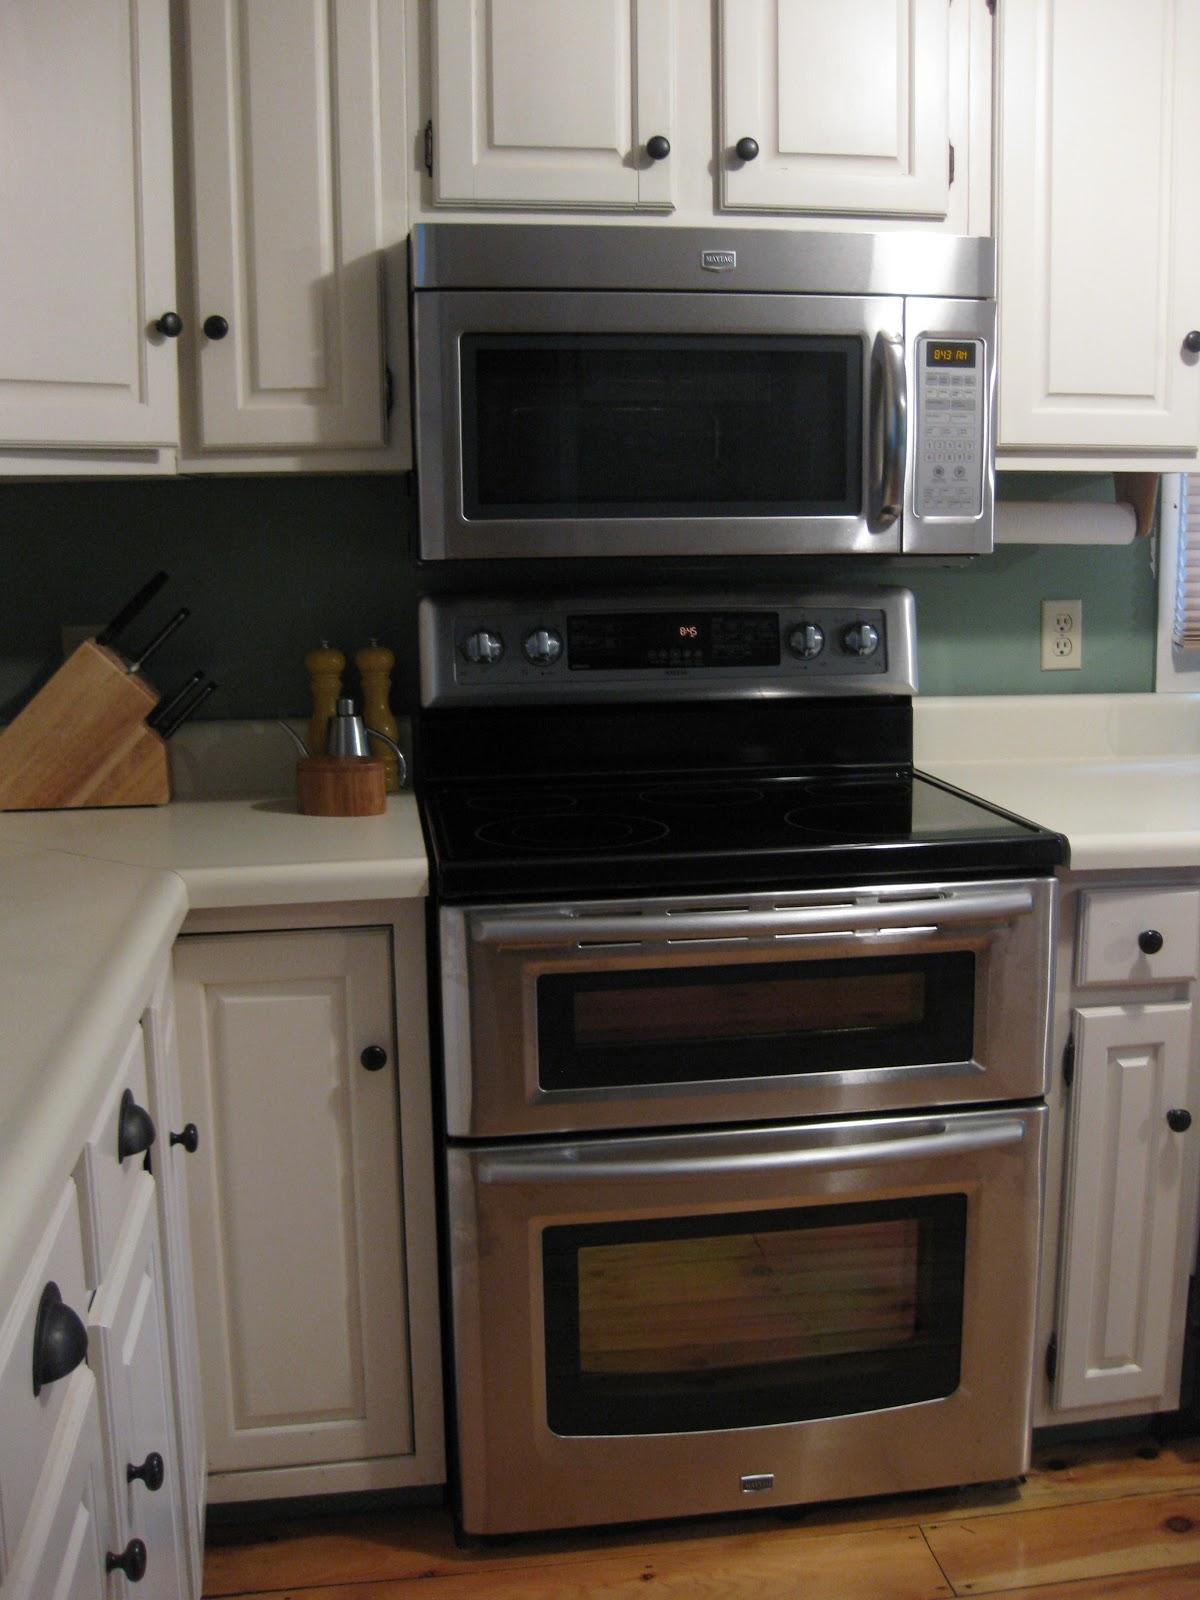 hotpoint oven wiring diagram automotive schematics 2 microwave fuse location repair ~ elsalvadorla